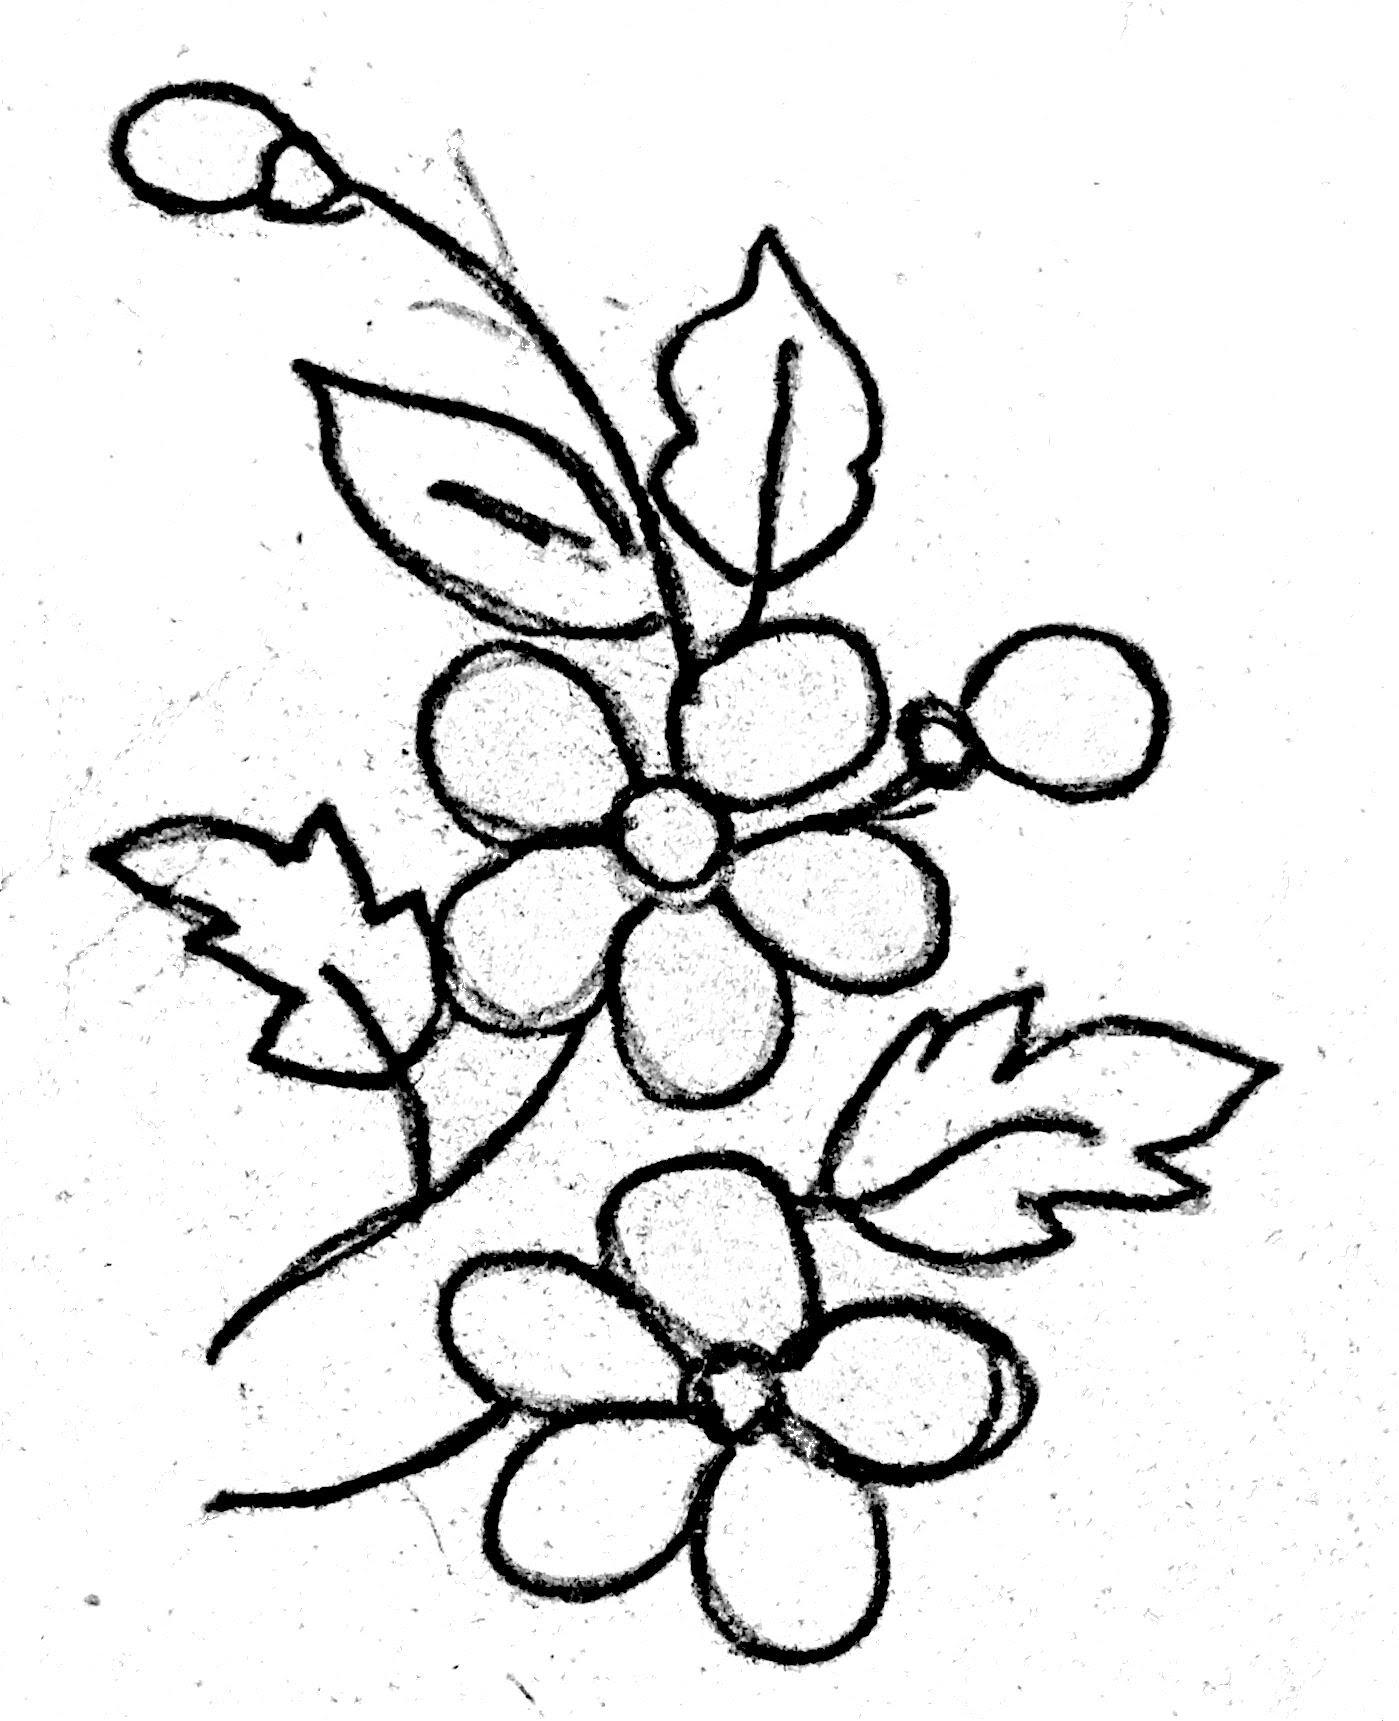 1399x1721 Girls With Flower Crown Drawings Tumblr Girl Drawing Flower Crown